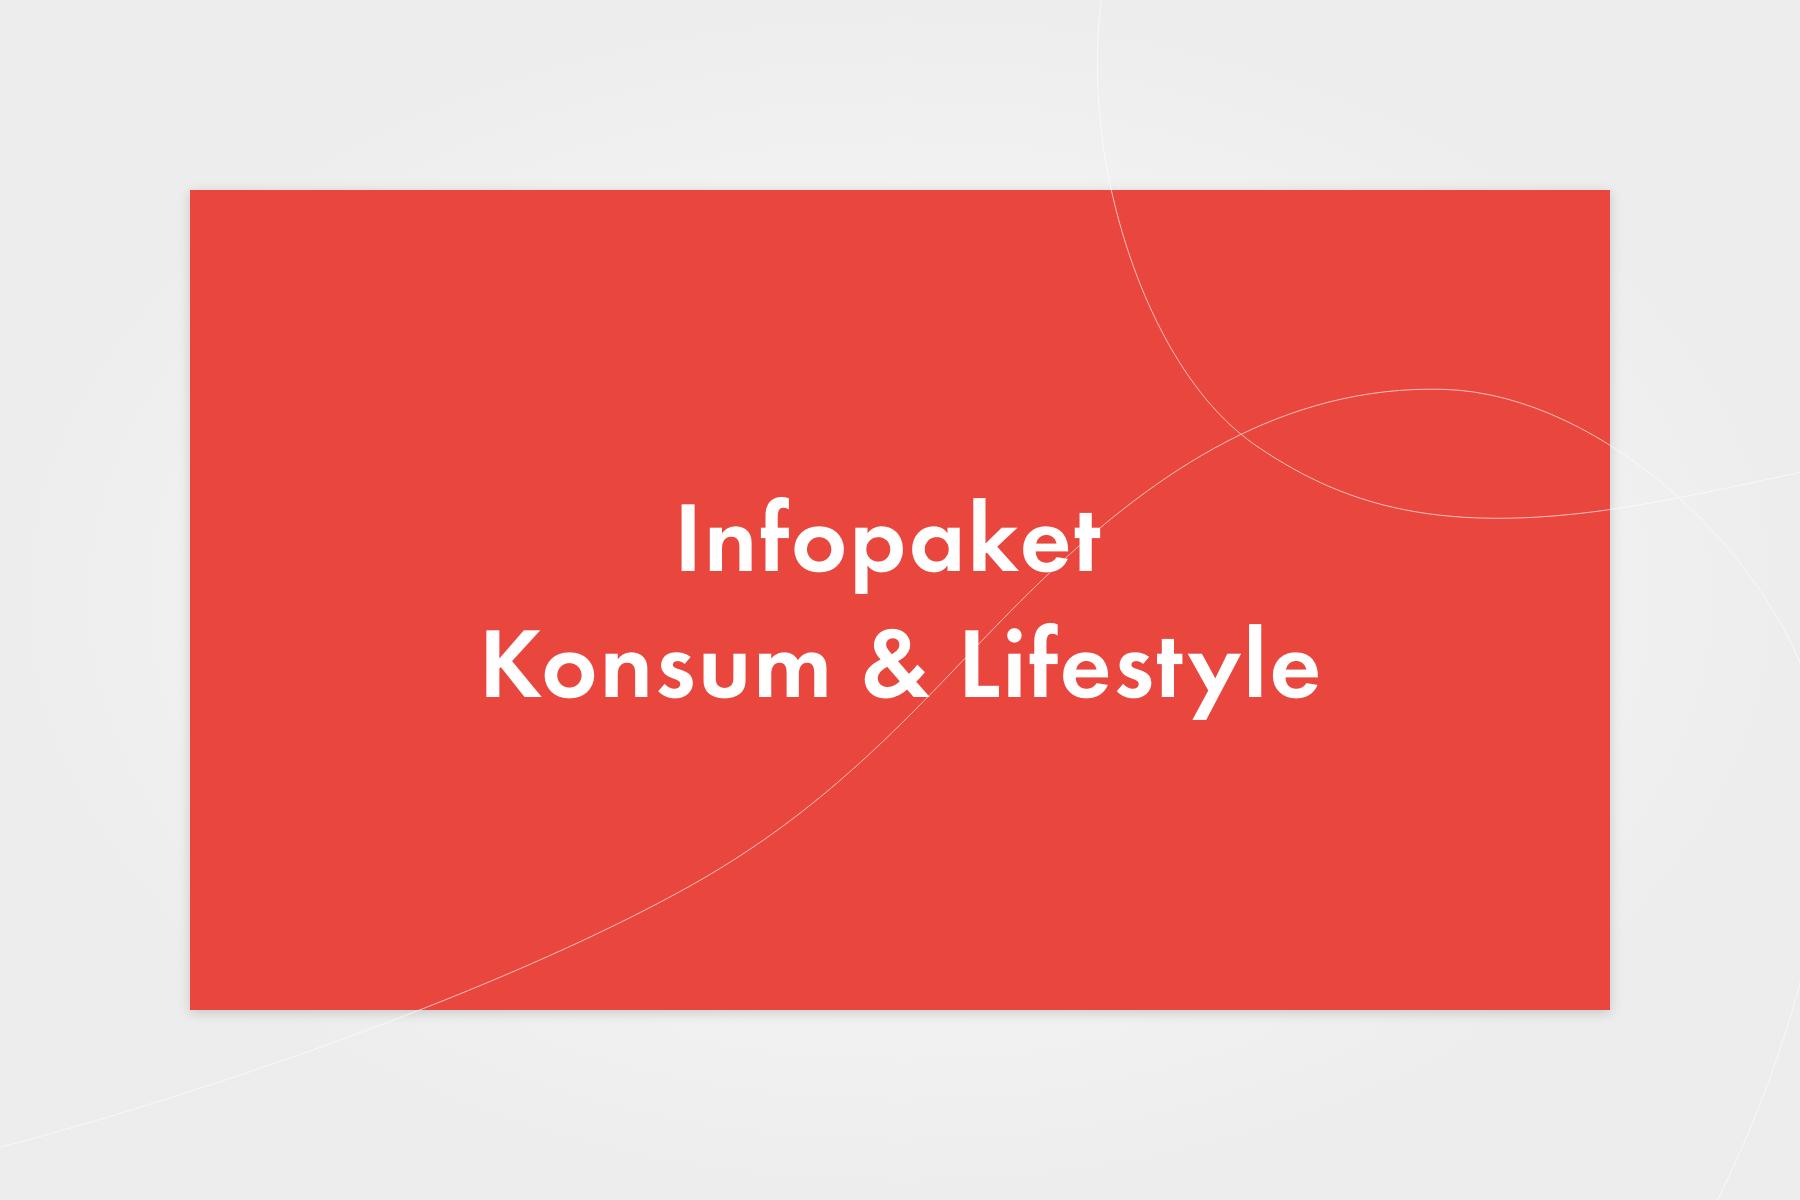 Sinus Infopaket Konsum & Lifestyle